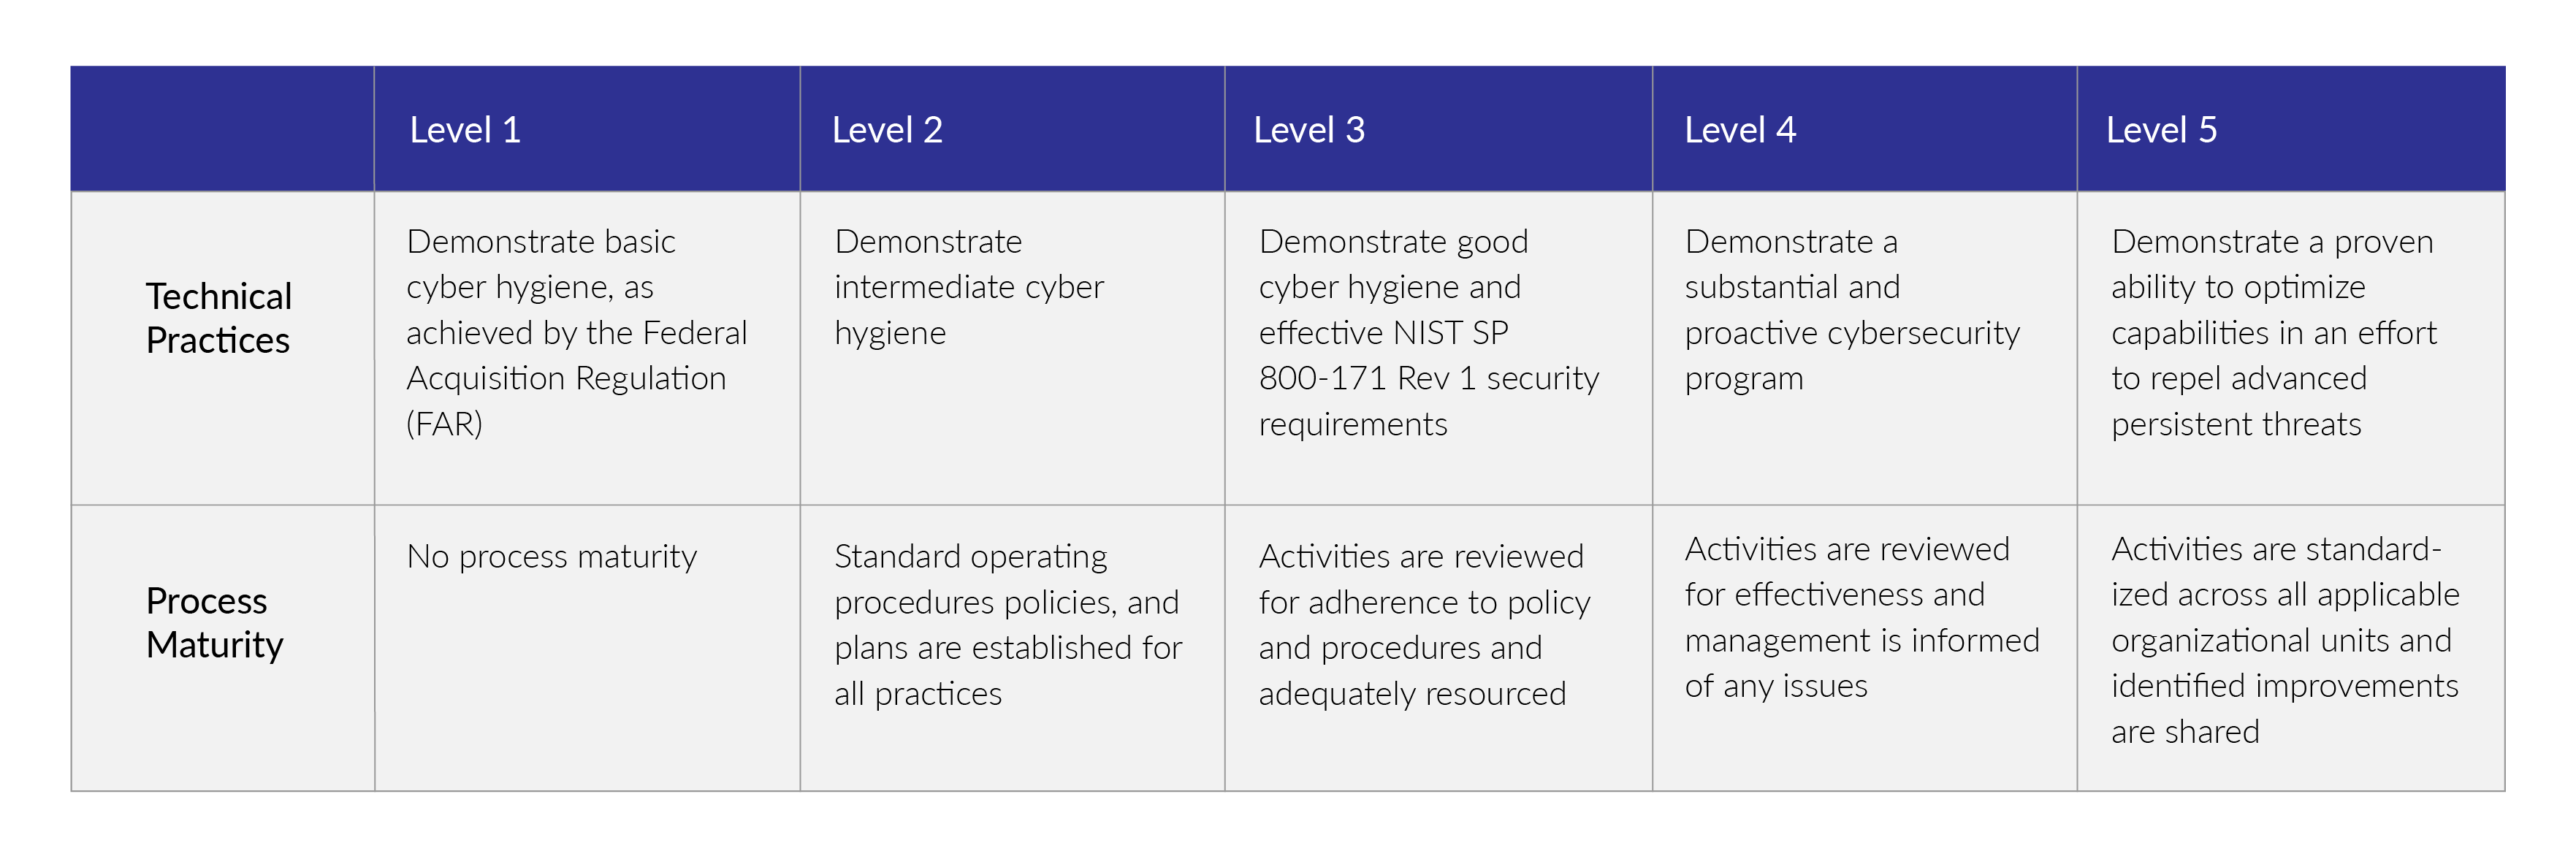 Summary Of CMMC Levels